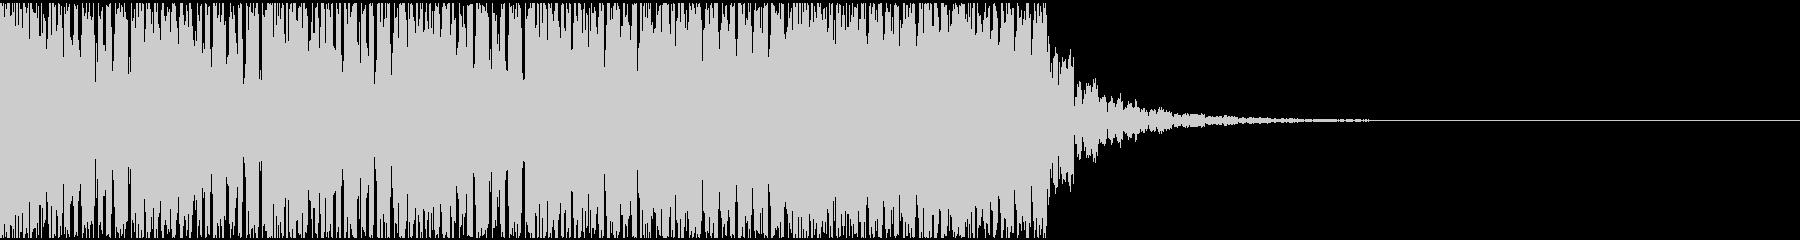 【EDM】約20秒、ジングル5の未再生の波形